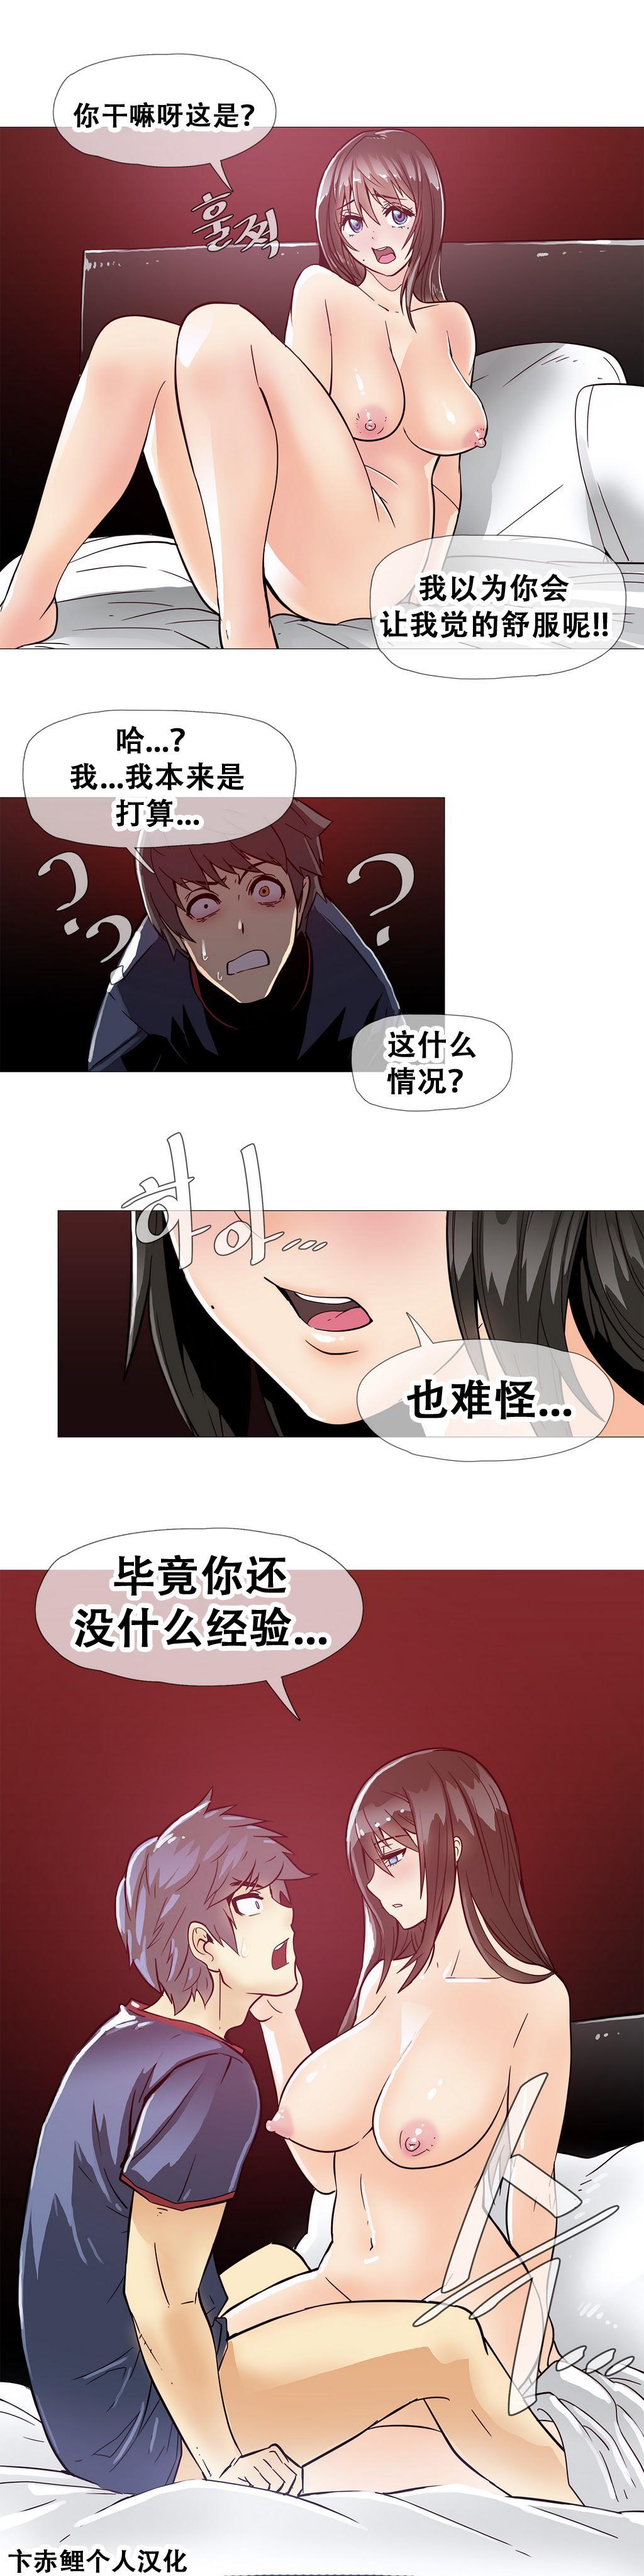 HouseHold Affairs 【卞赤鲤个人汉化】1~21话(持续更新中) 249